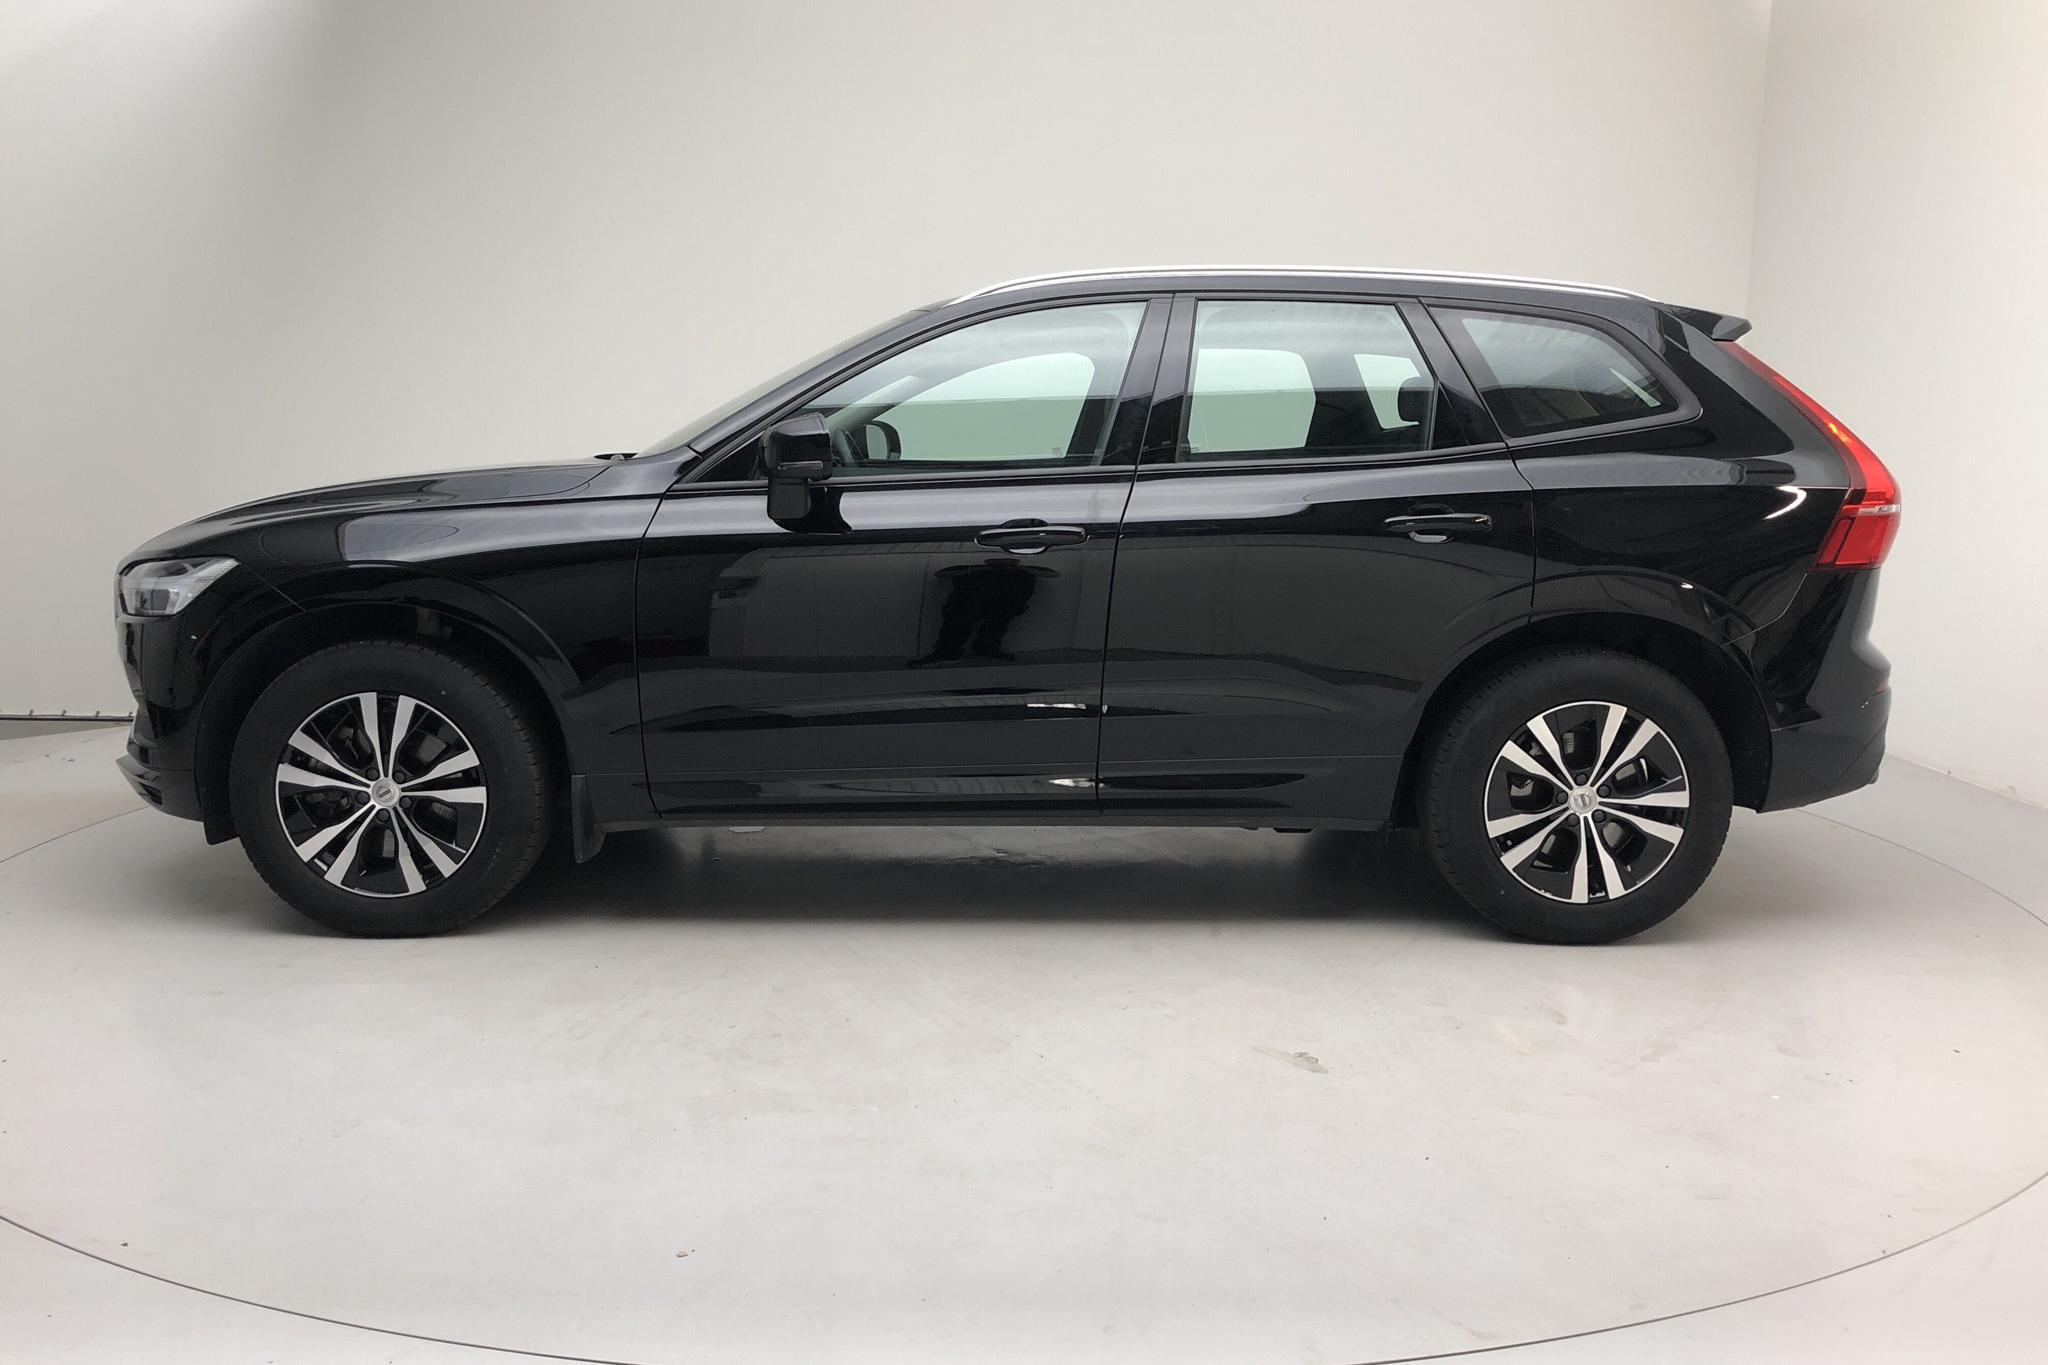 Volvo XC60 B4 AWD Mildhybrid, Diesel (197hk) - 41 950 km - Automatic - black - 2020